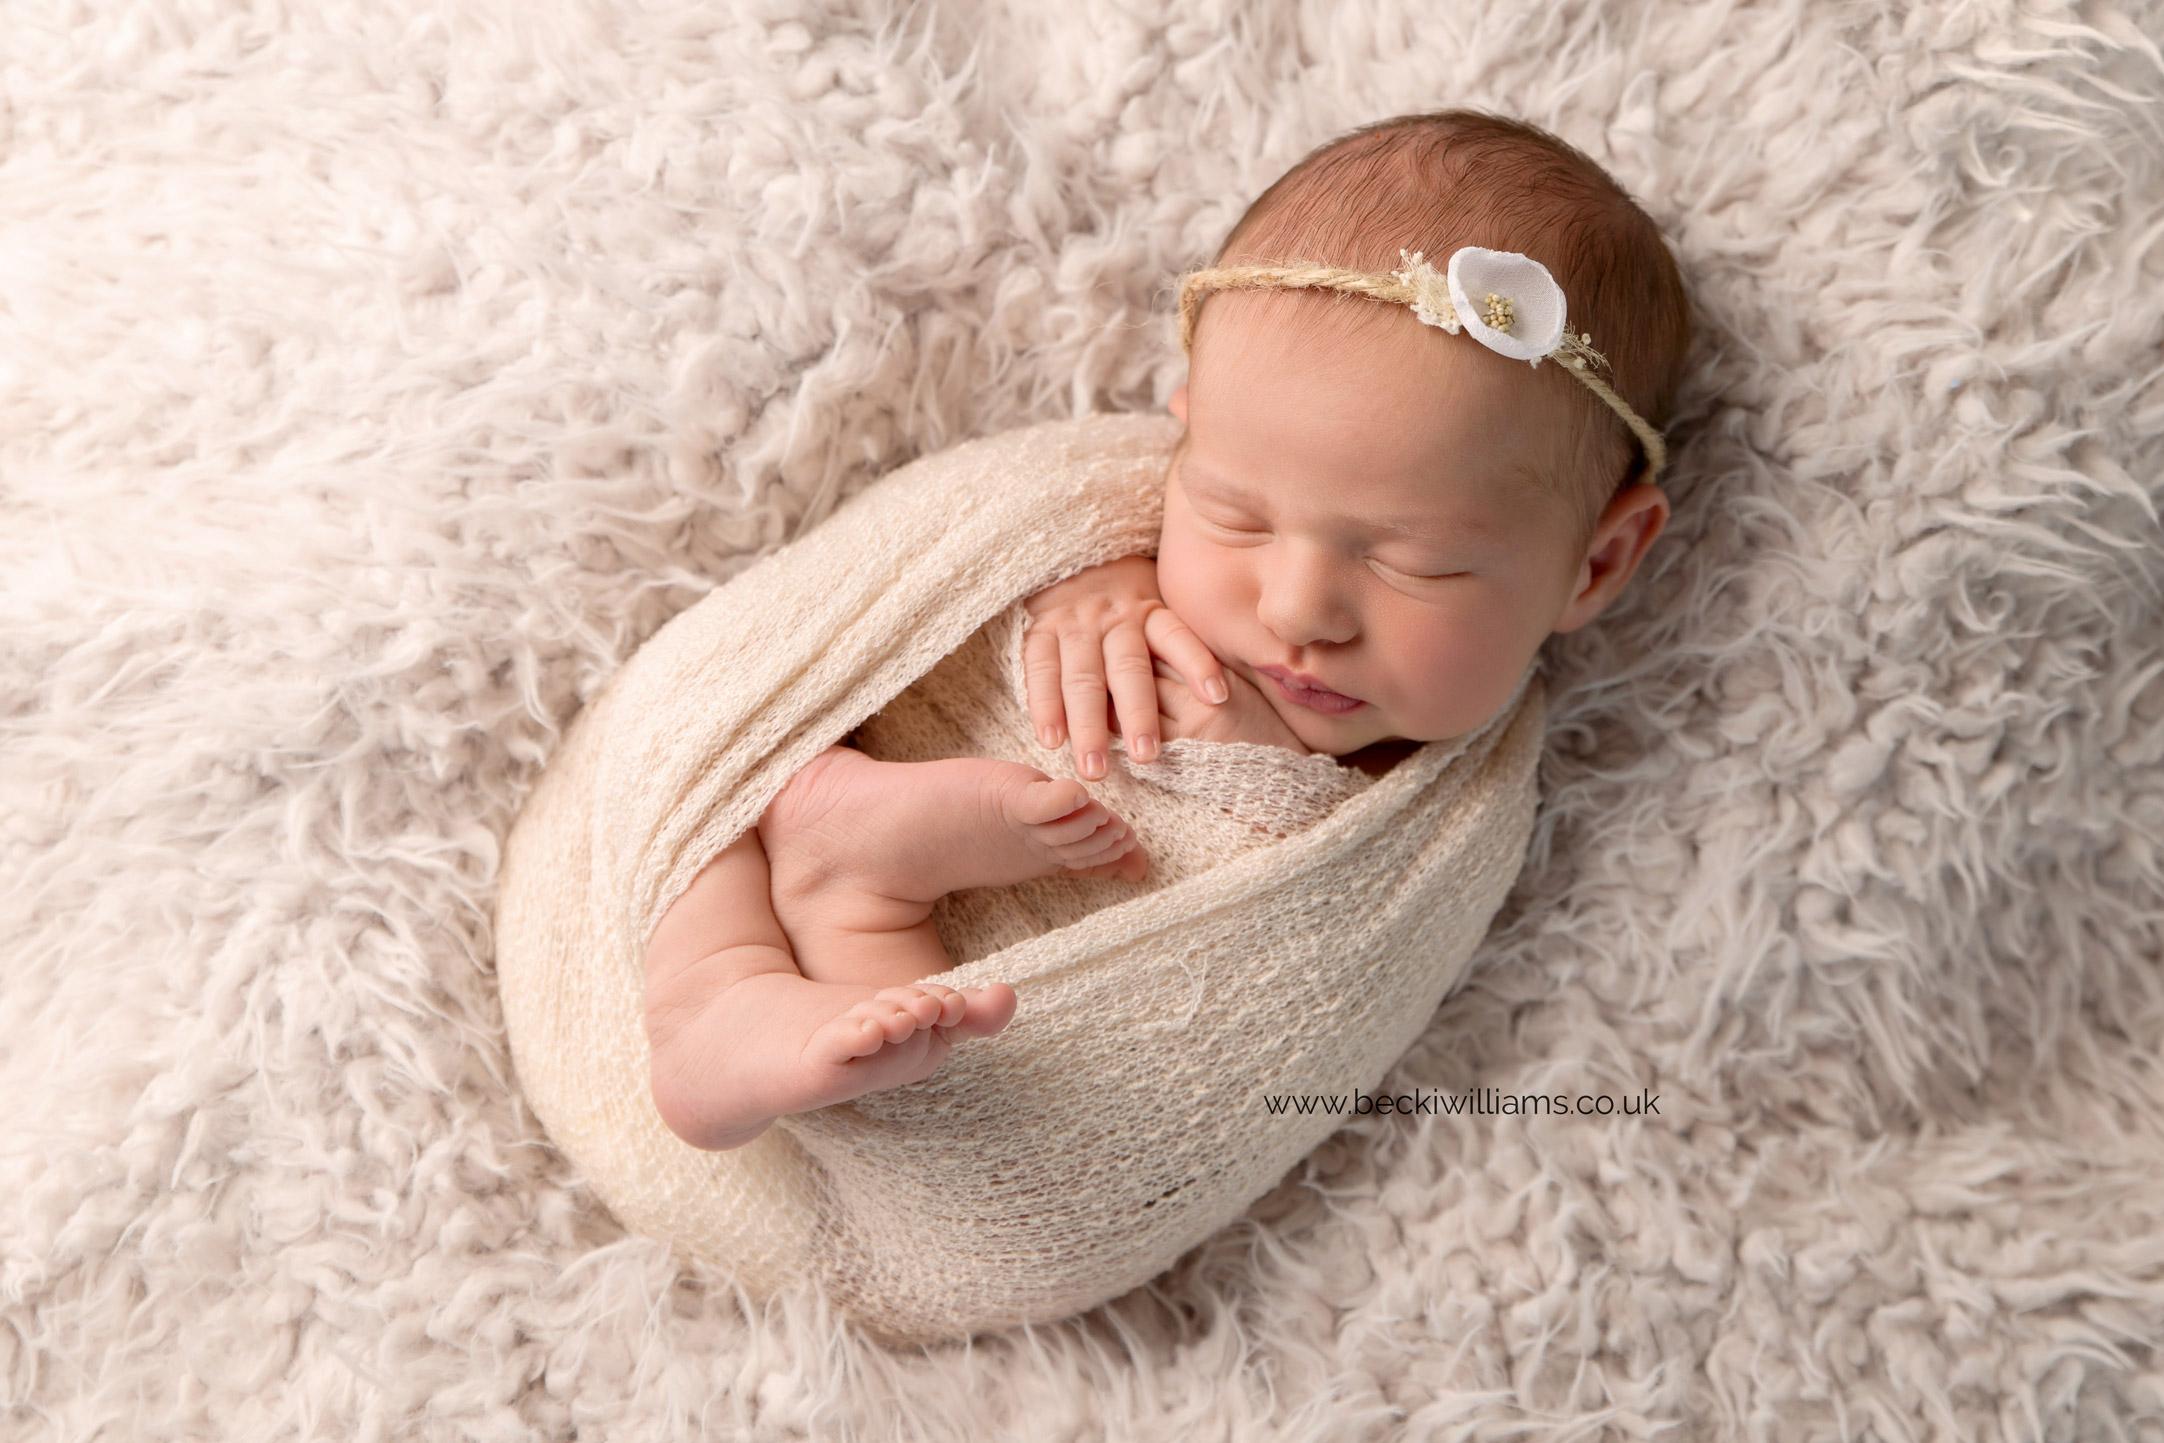 newborn-Hertfordshire-photograher-cute-asleep-wrapped-neutral-headband.jpg